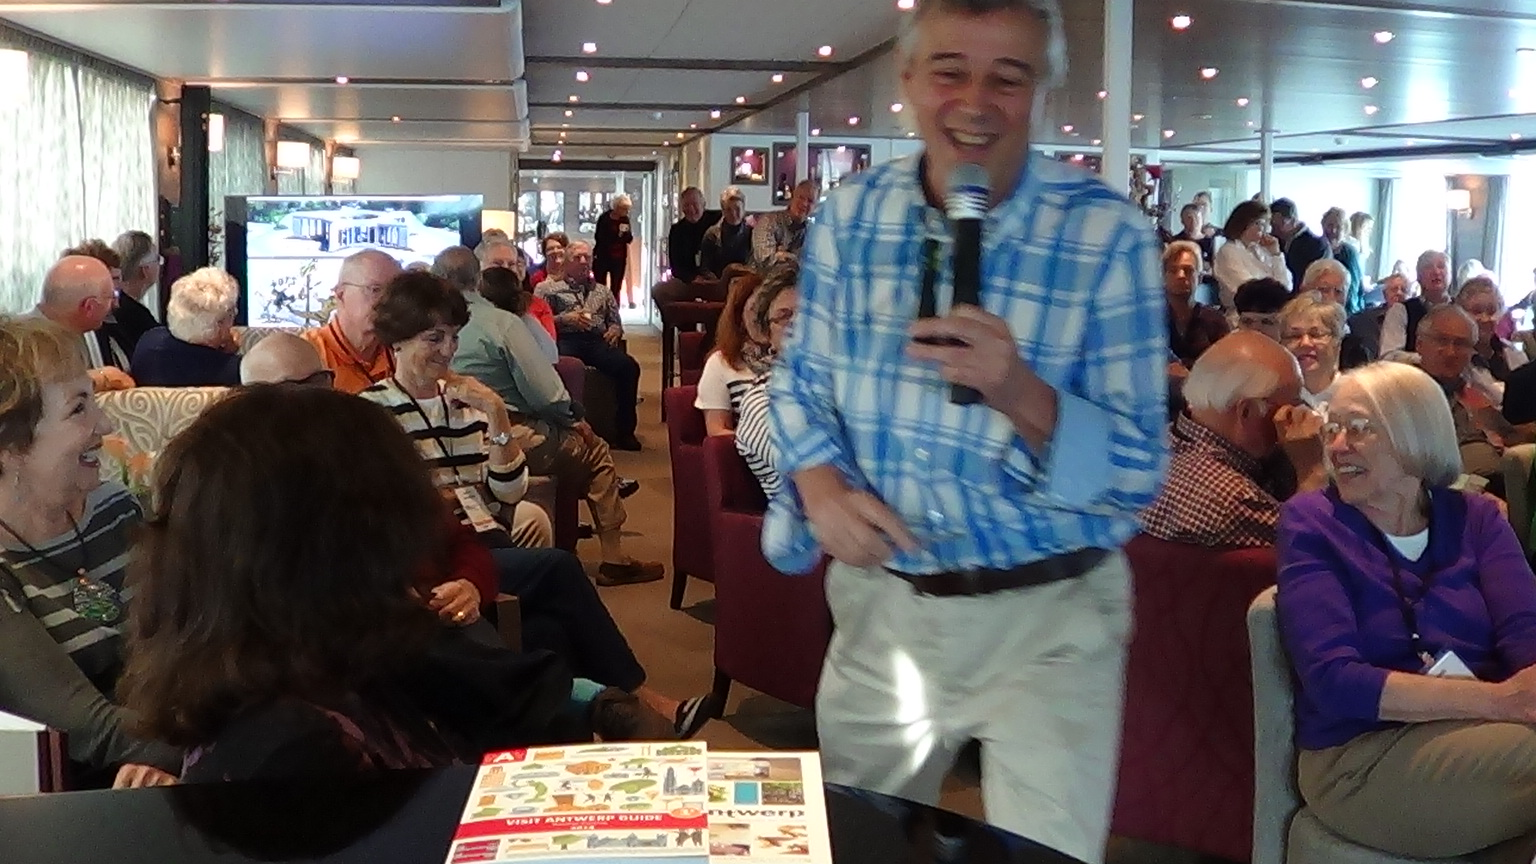 Harry van Hest - video: 'Contemporary Belgium' - Belgium for foreigners